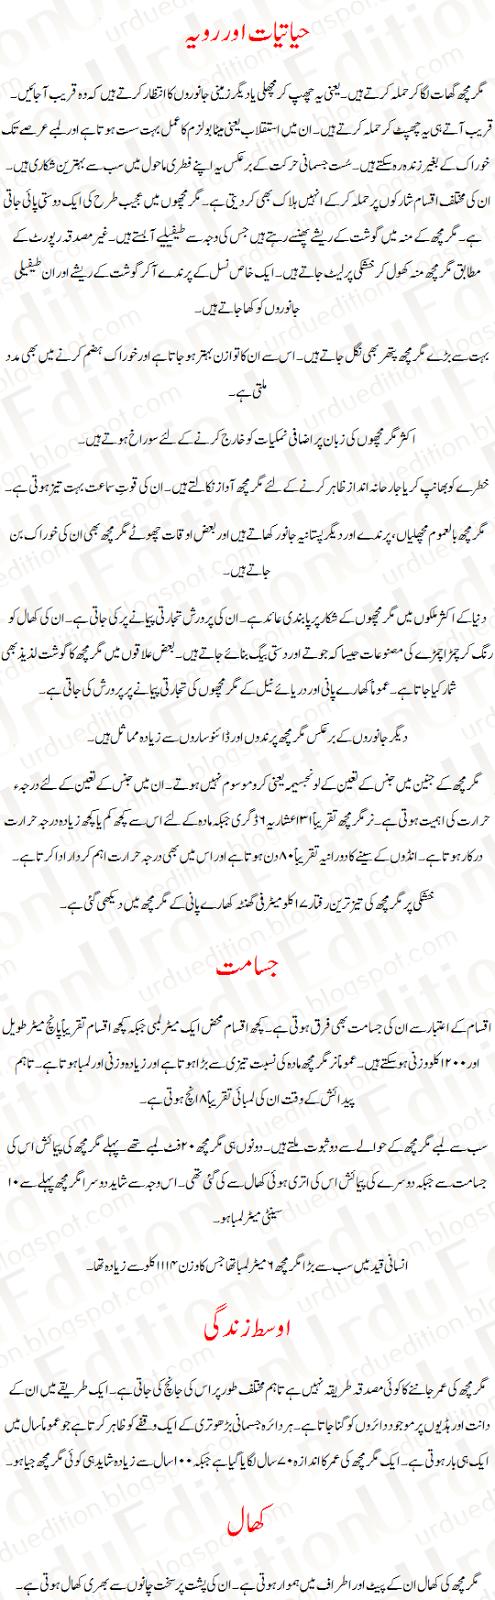 Crocodile paragraph in urdu